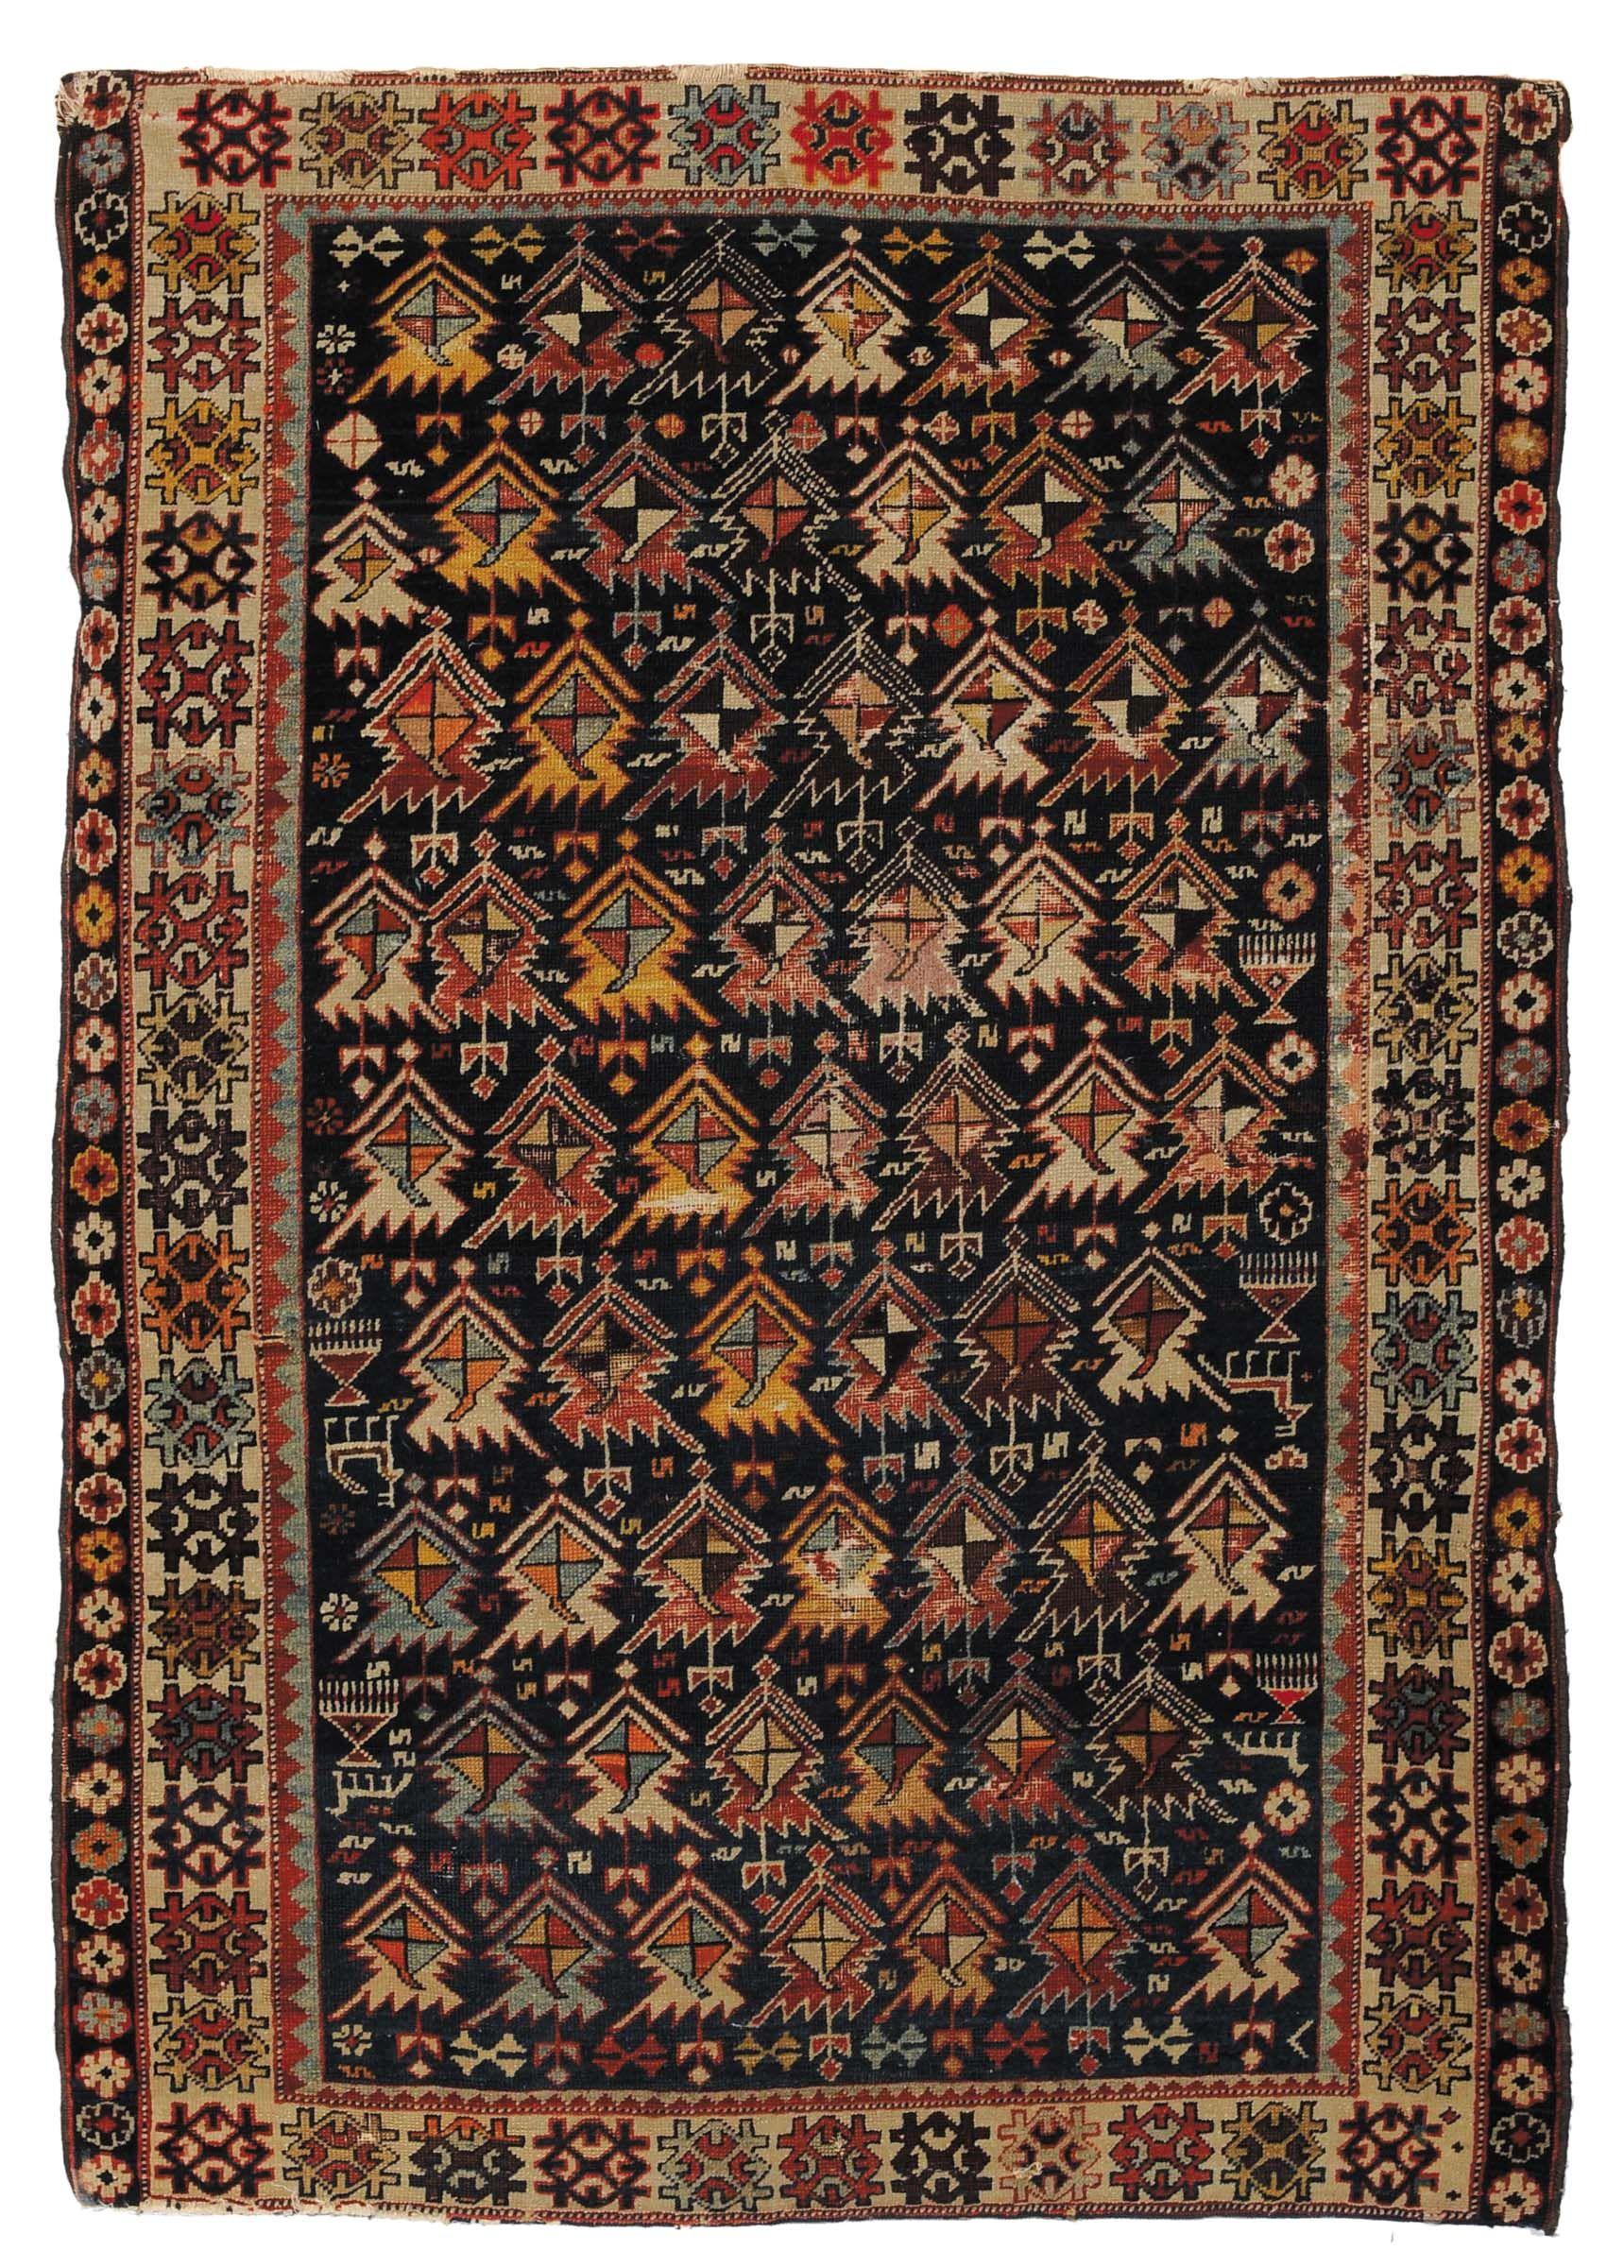 tappeti caucasici antichi Tappeto caucasico Shirvan, fine